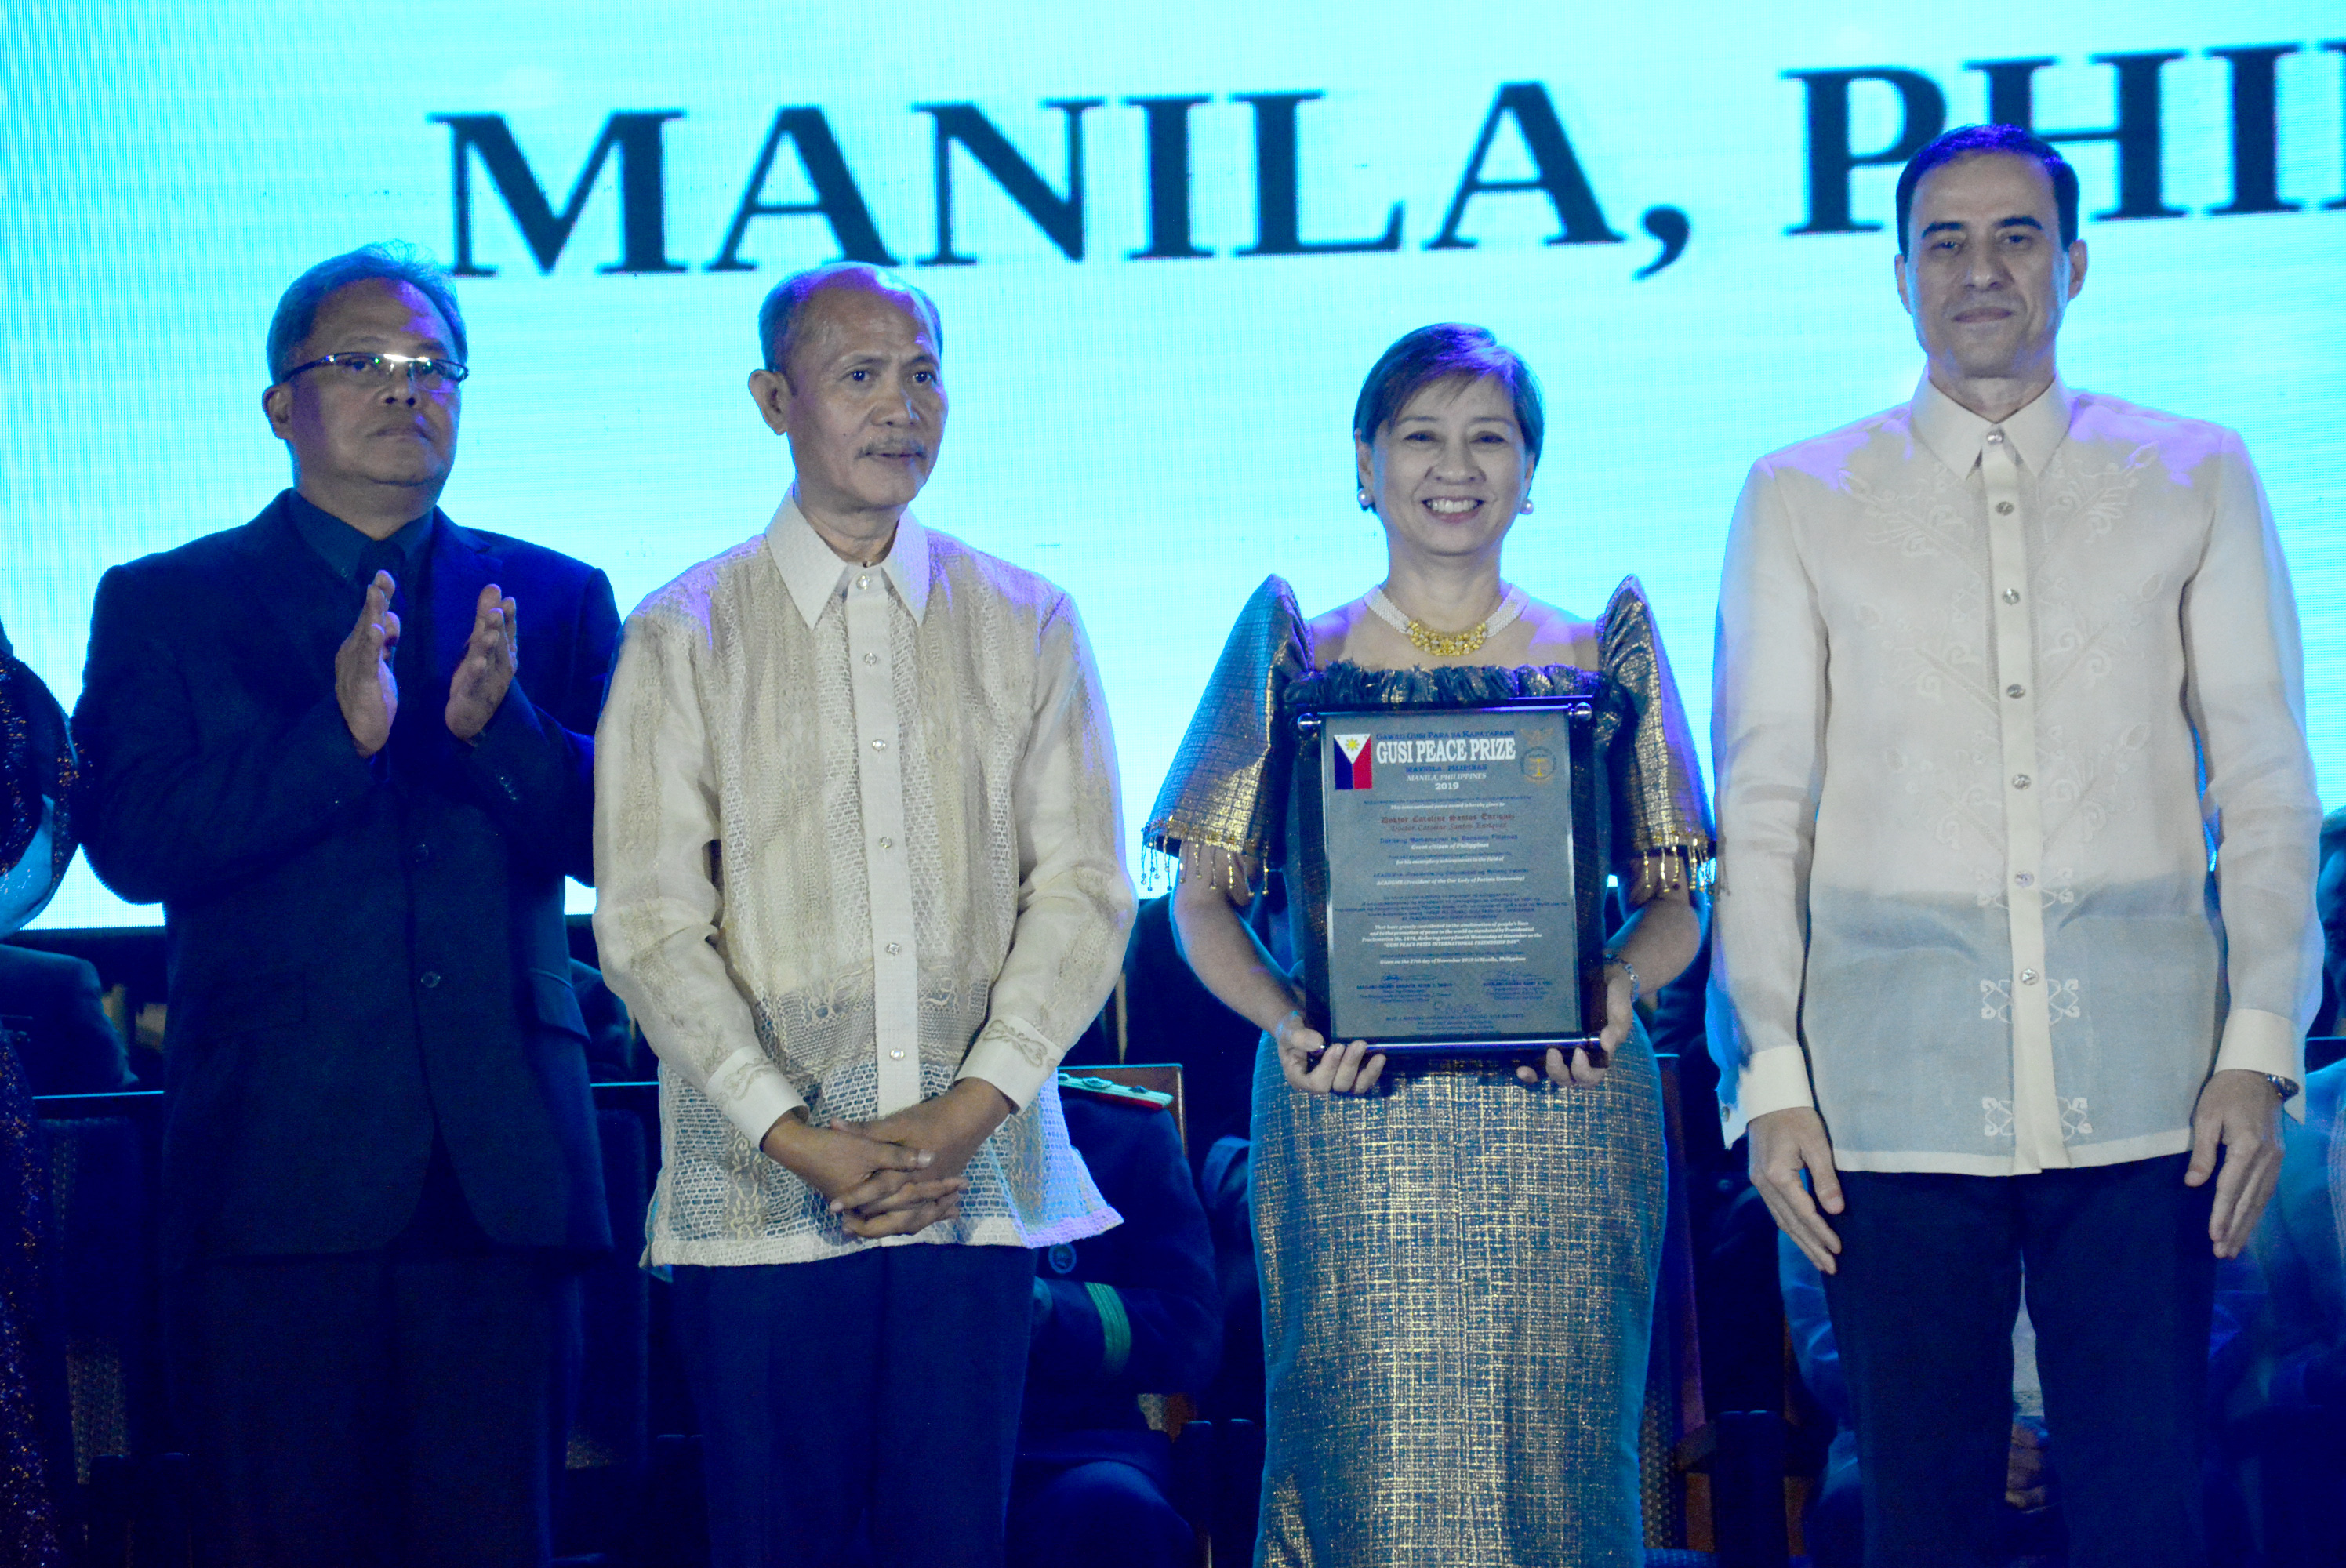 Foremost educator Dr. Caroline Enriquez awarded the Gusi Peace Prize